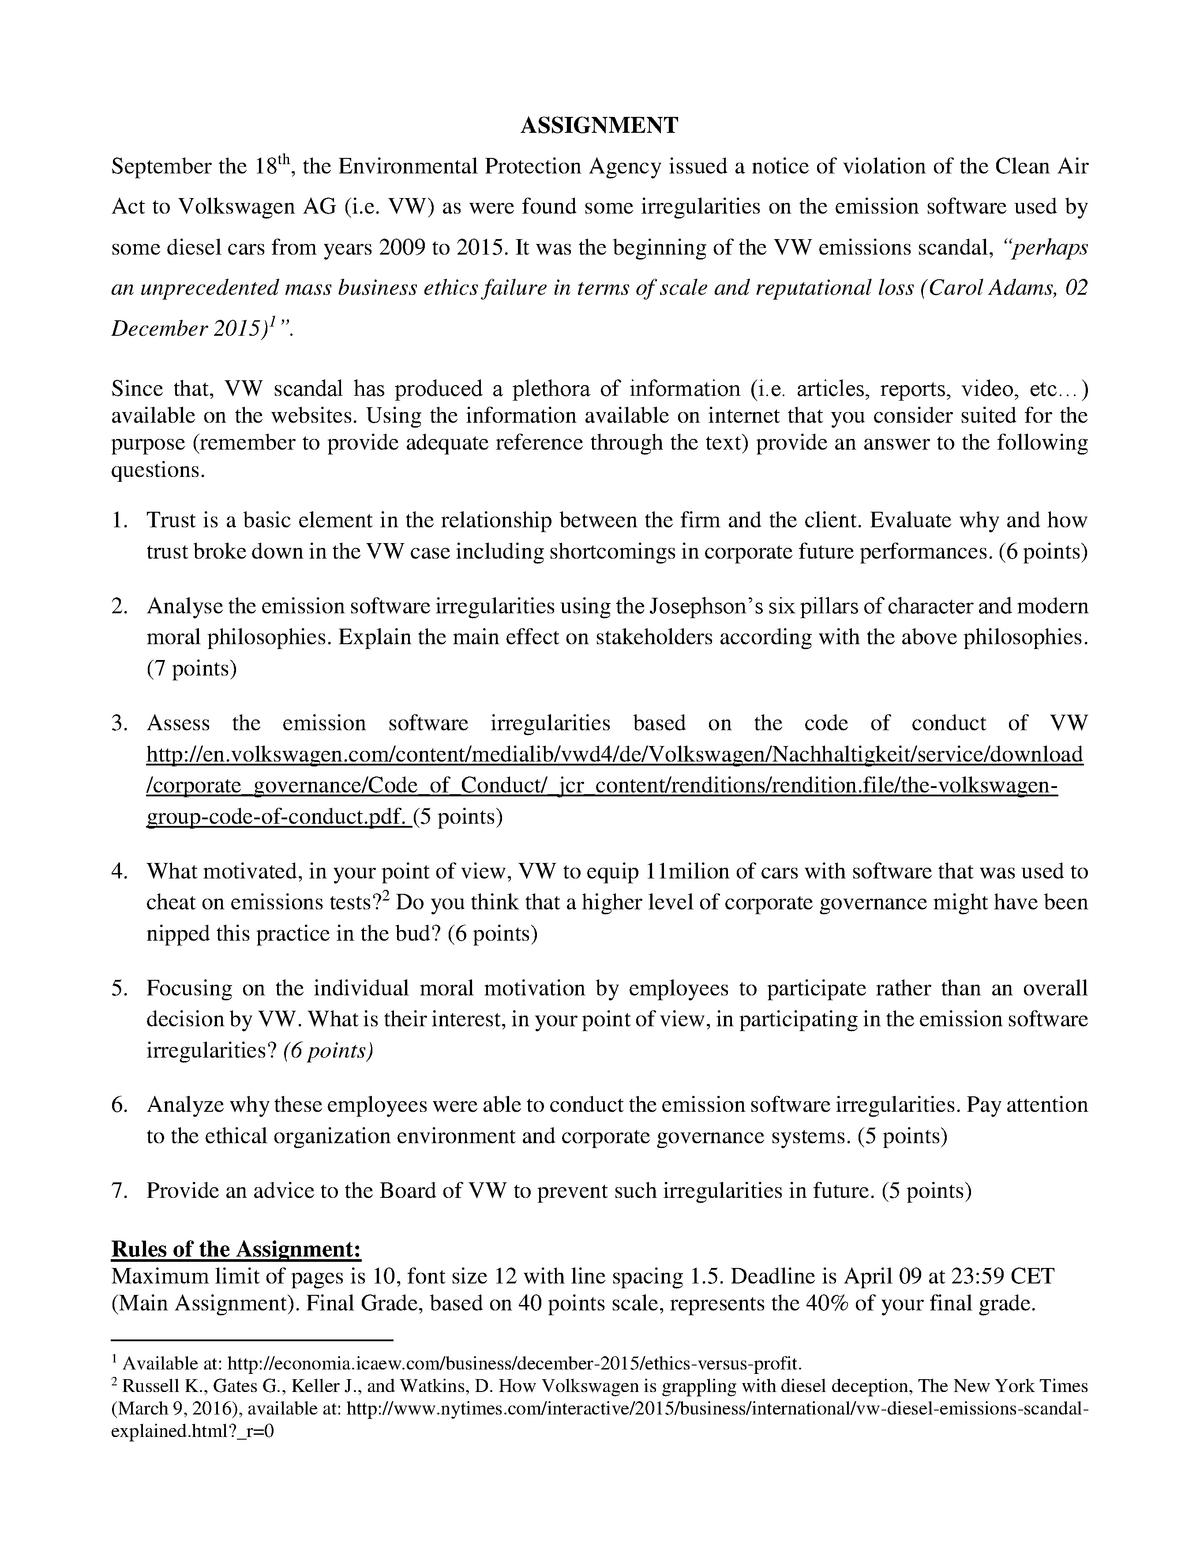 Seminar assignments - Assignment Volkswagen, questions